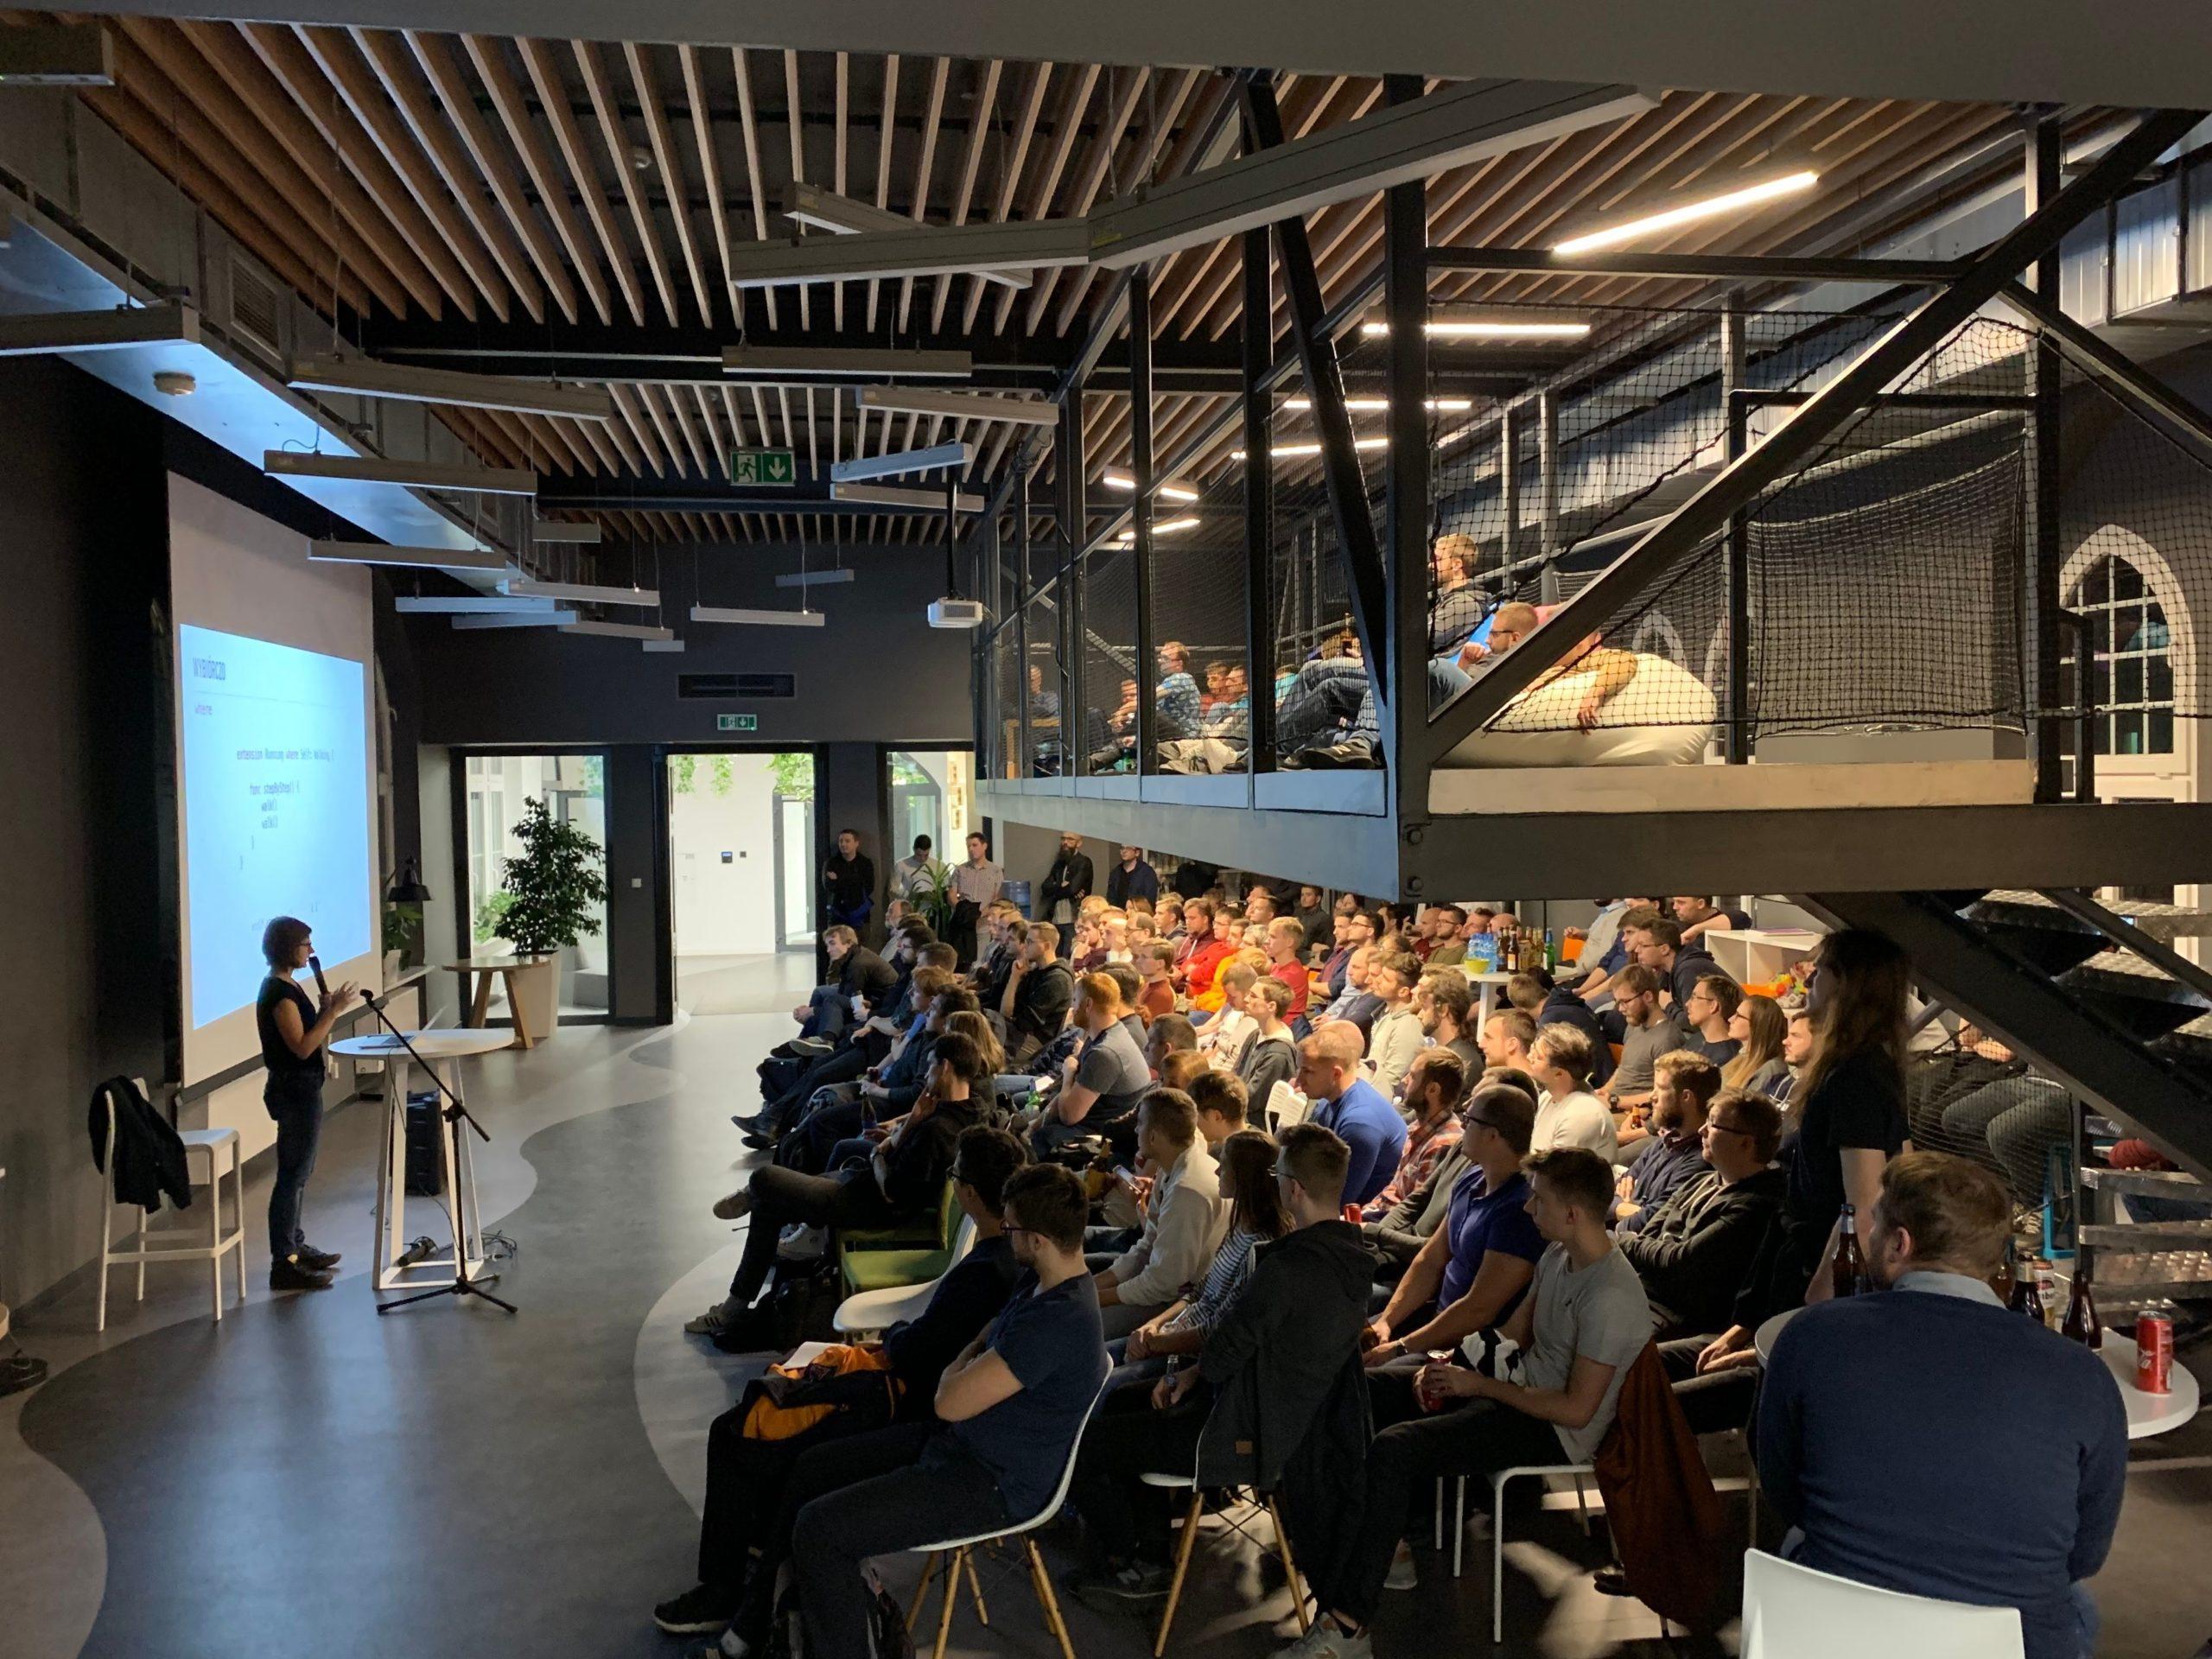 uszanowanko programowanko developer presentation local meetup